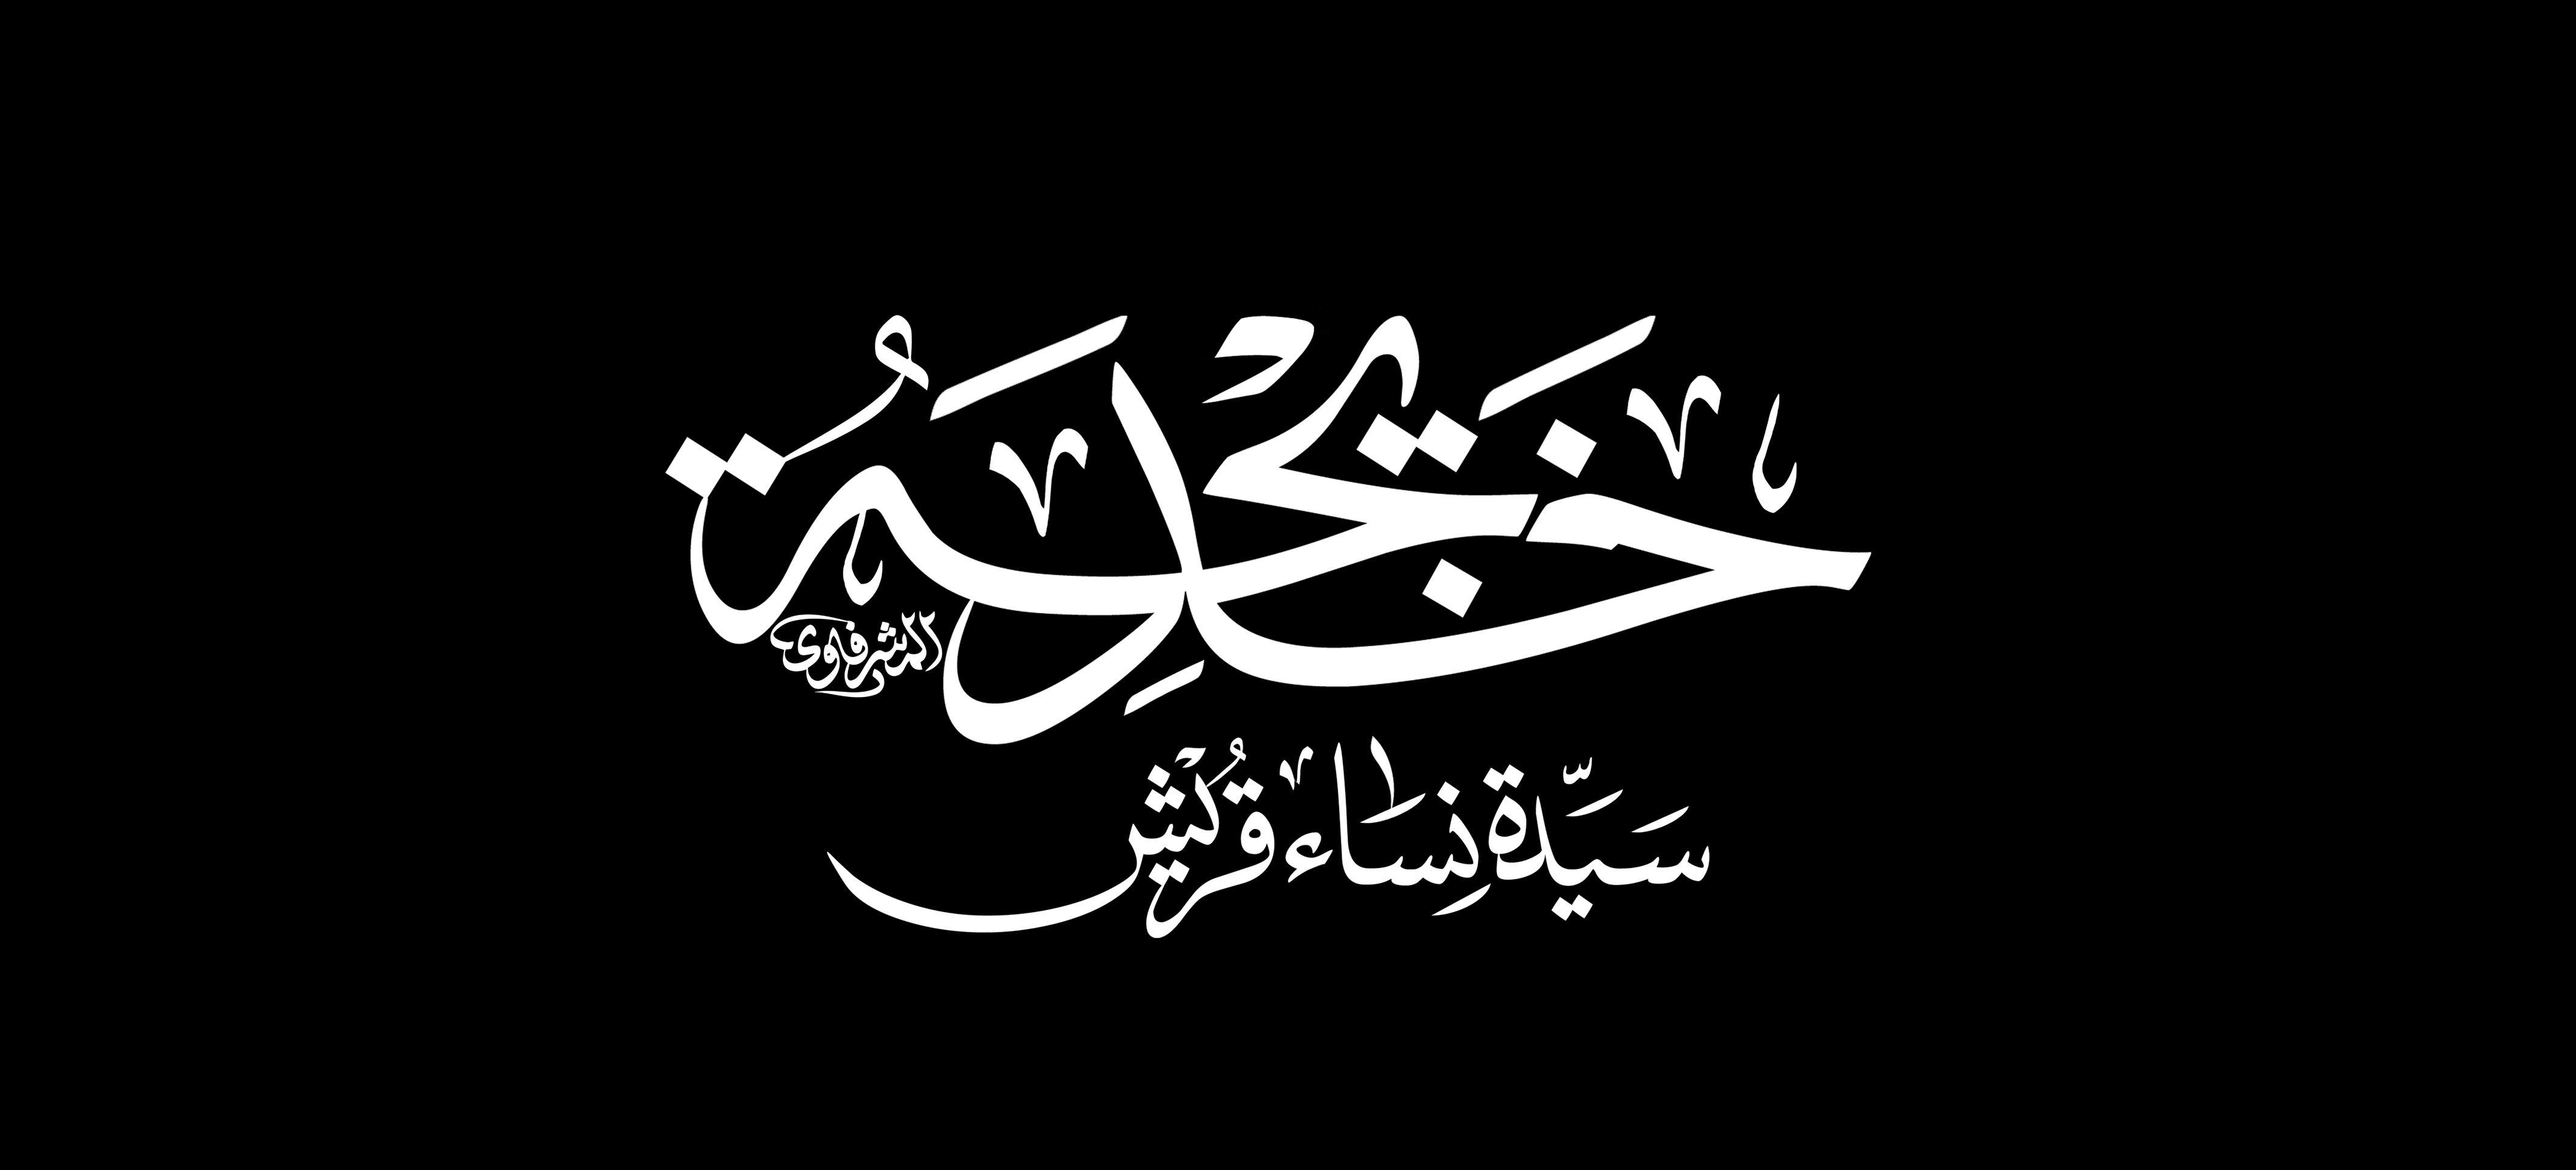 خديجة سيدة نساء قريش Tatoos Calligraphy Arabic Calligraphy